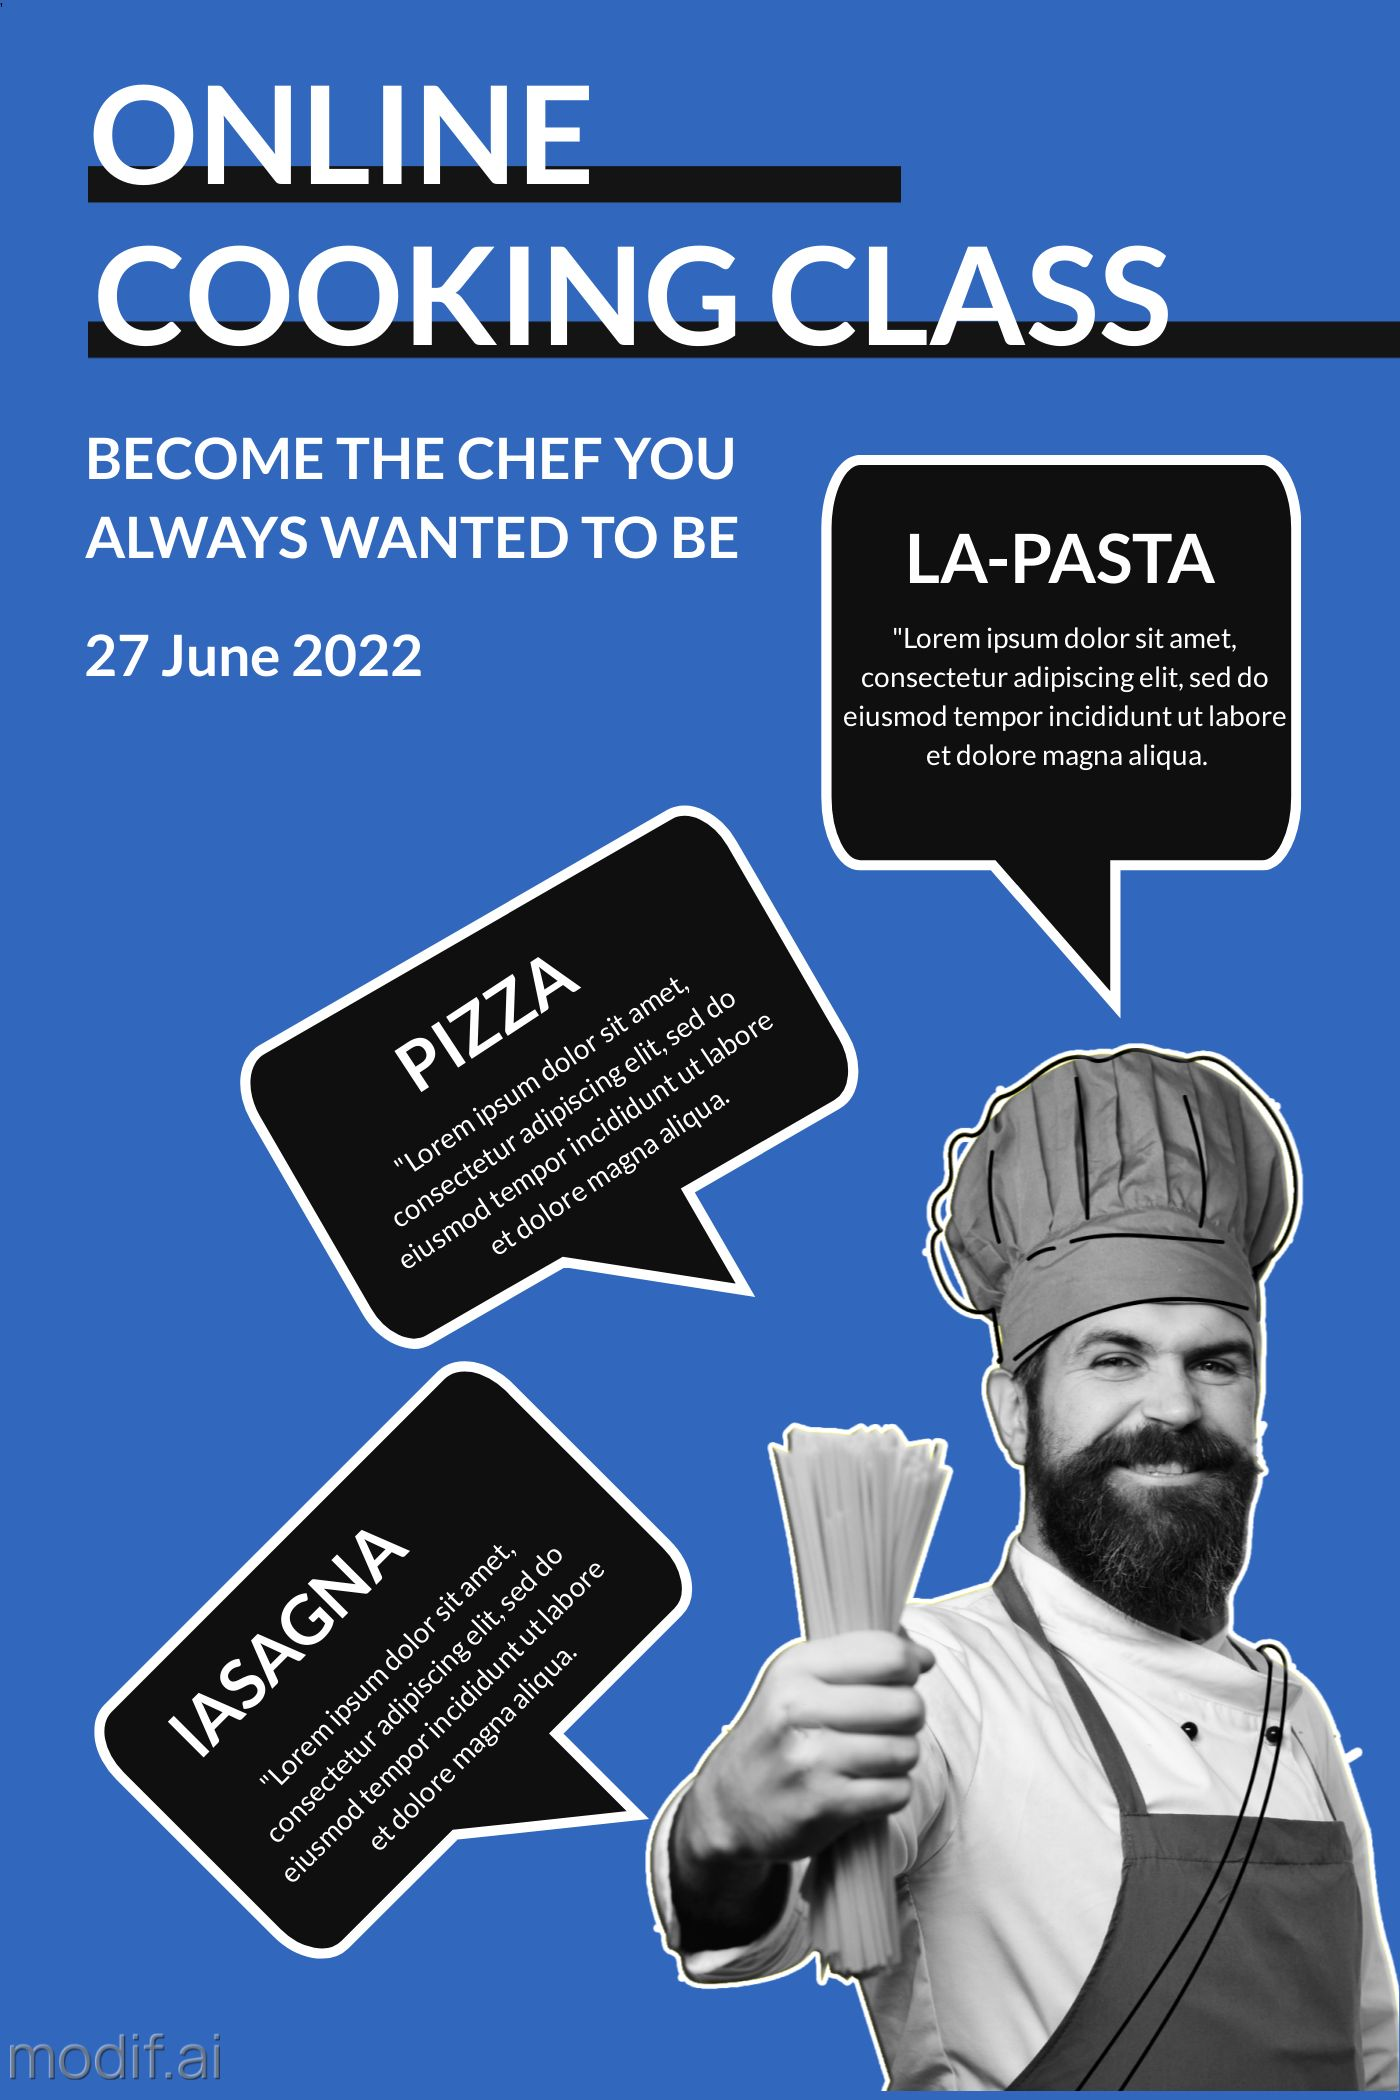 Online Cooking Class Template